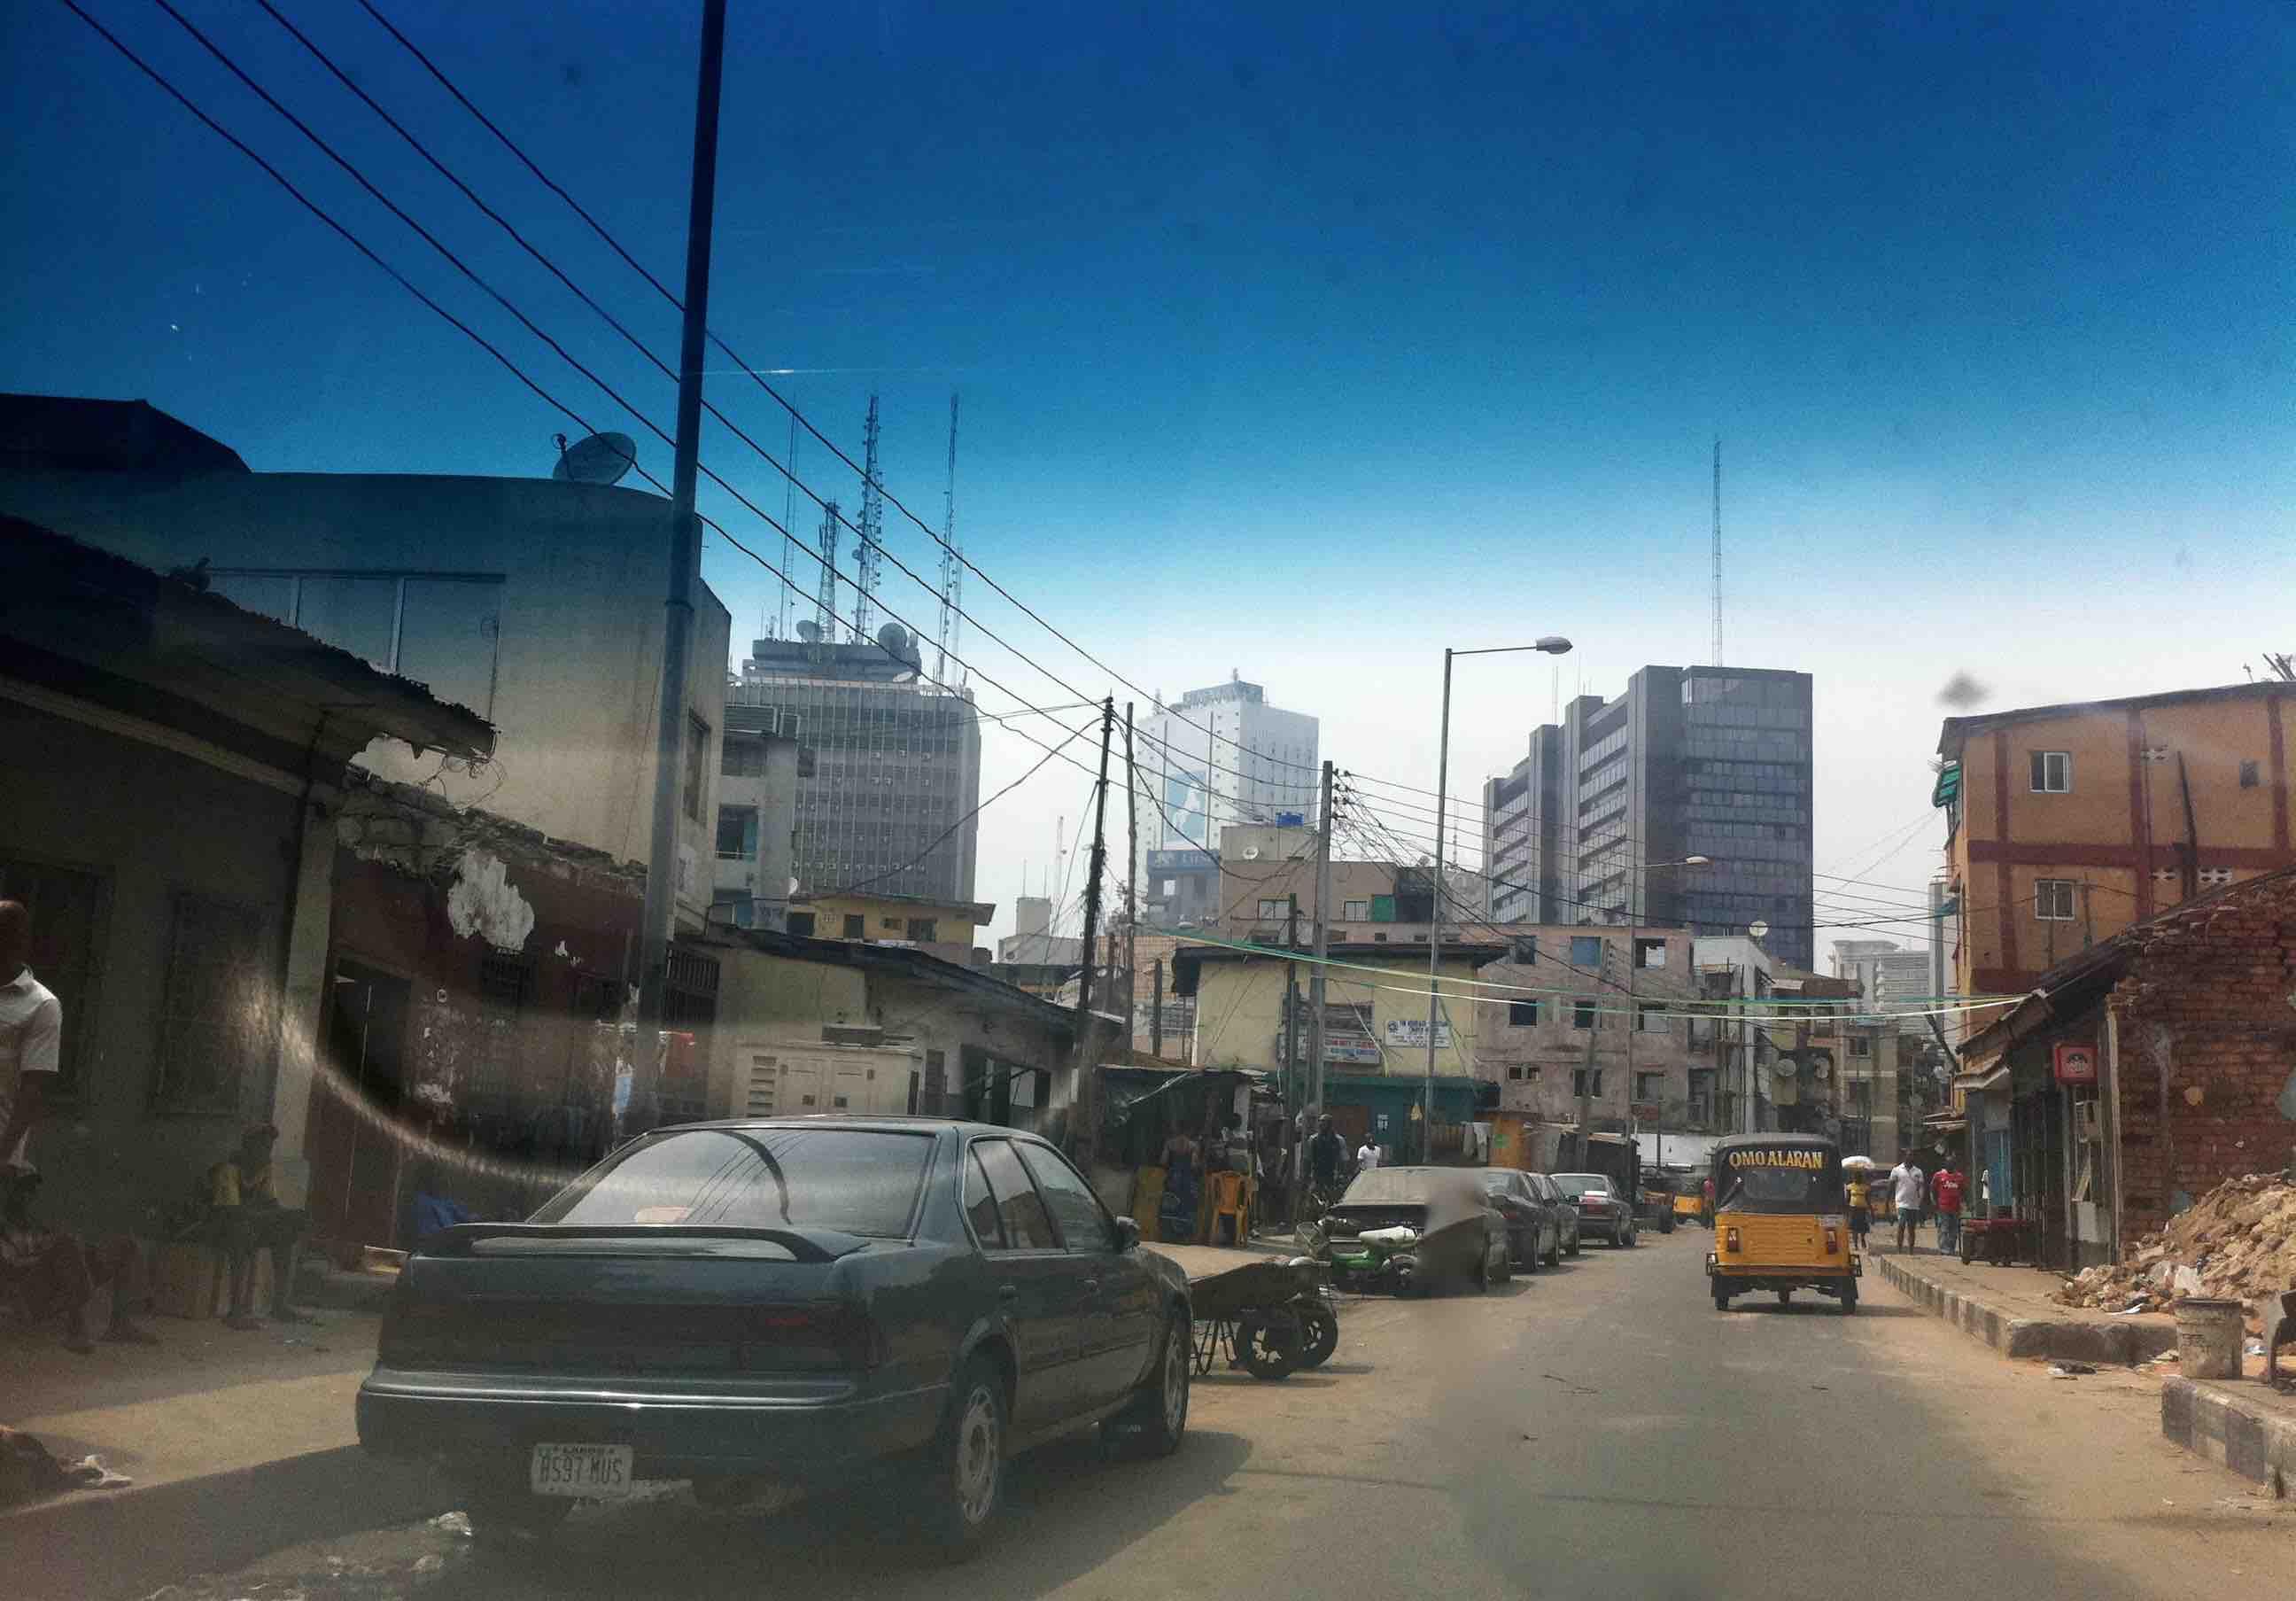 Bamgbose Street, Lagos Island, Lagos State, Nigeria. #JujuFilms